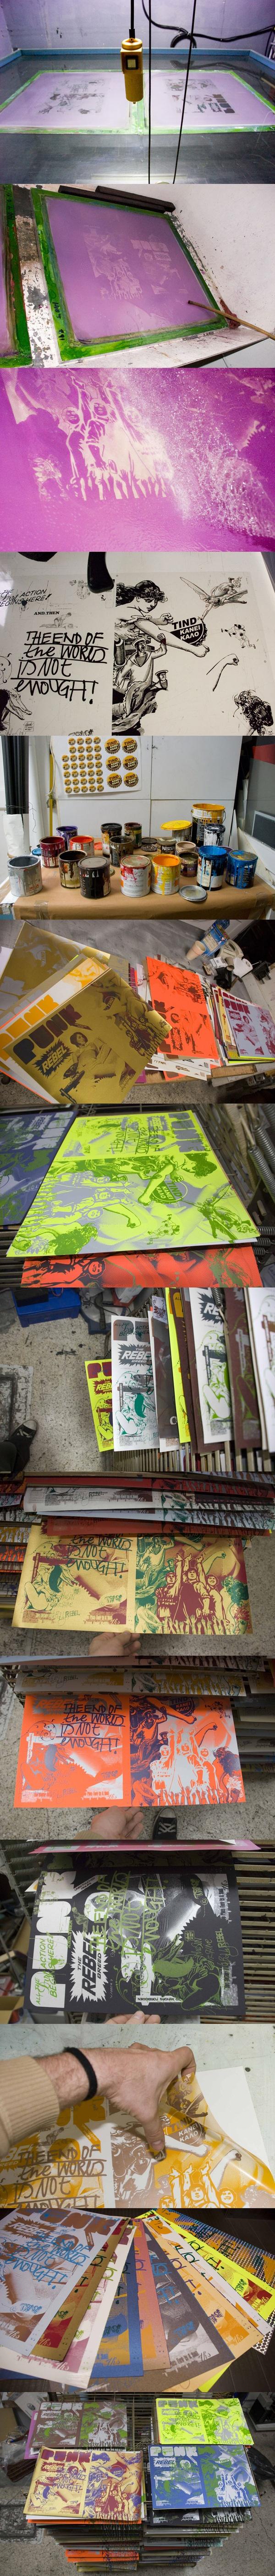 silkscreen printing by tind , via Behance